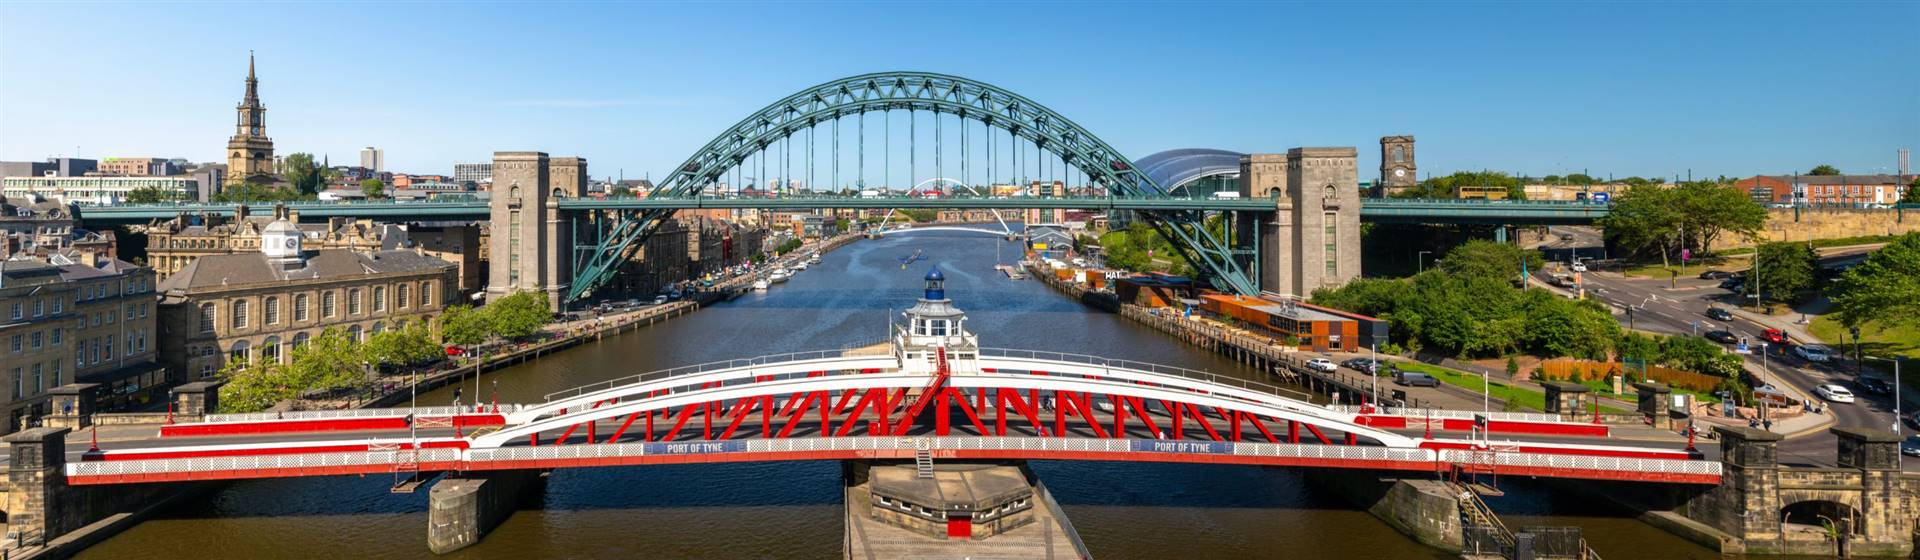 "<img src=""tynerivernewcastle-shutterstocklr.jpeg"" alt=""Tyne River - Newcastle""/>"